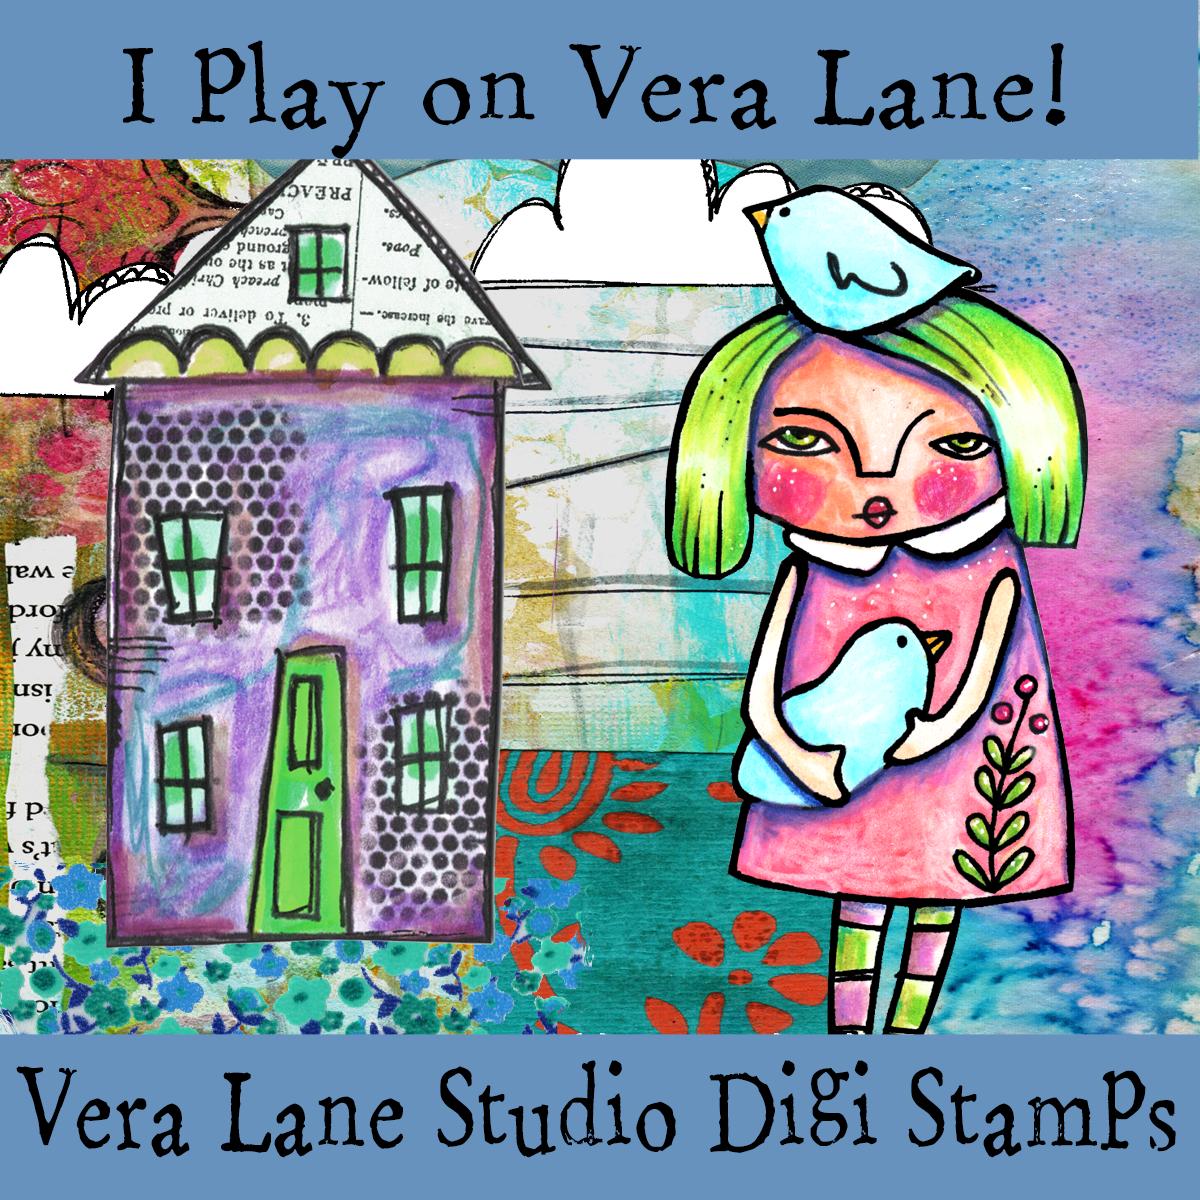 Vera Lane Studio Digi Stamps